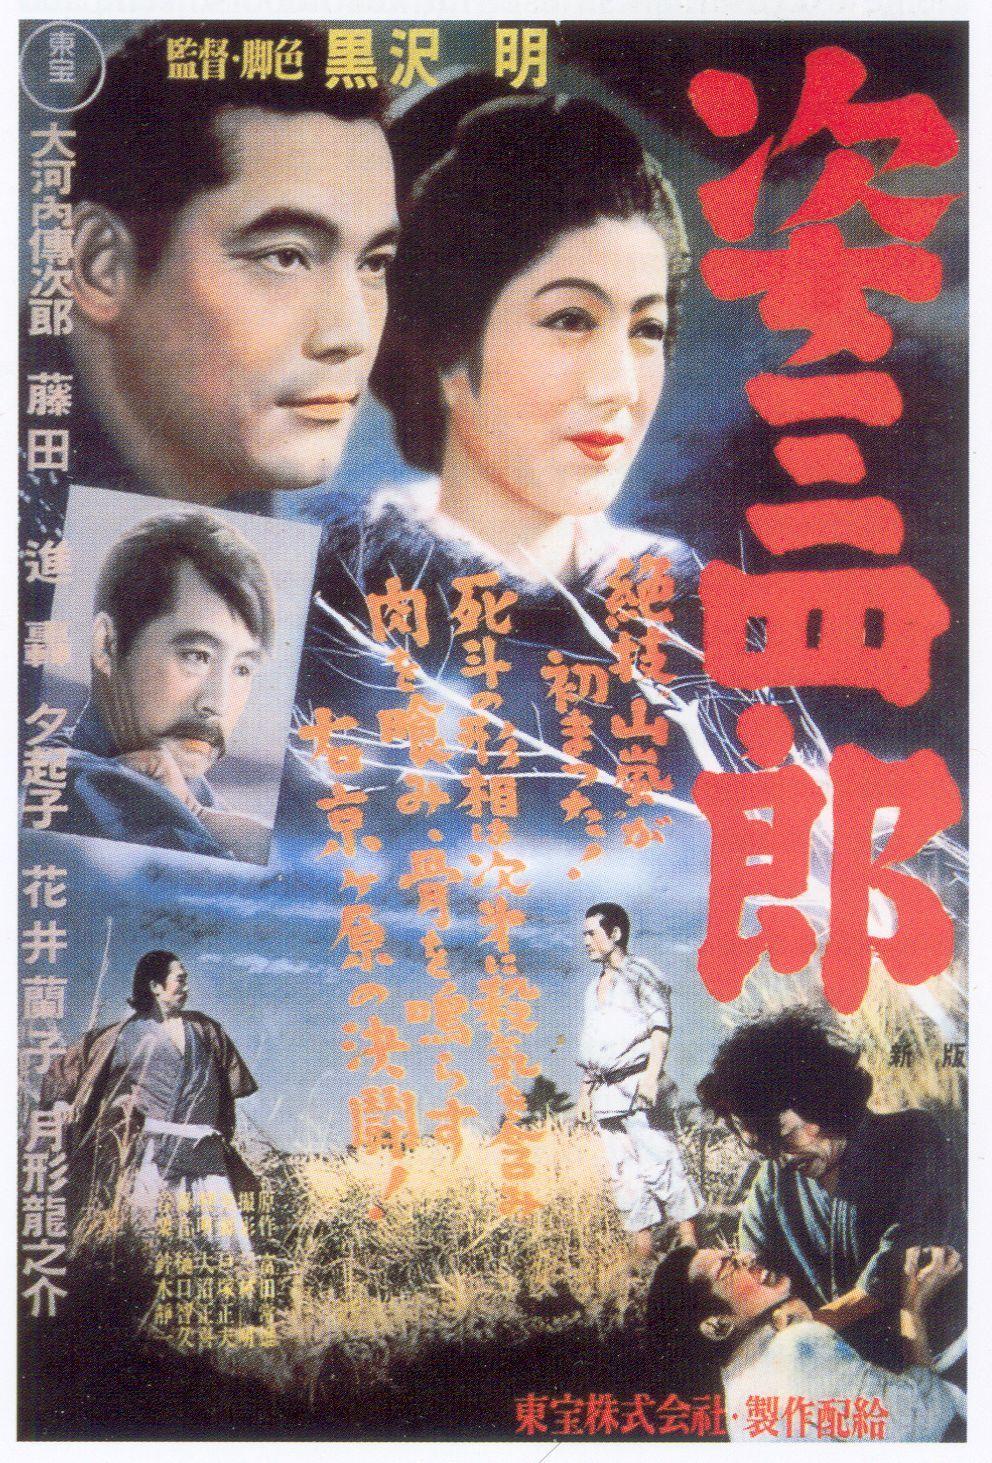 Легенда о великом мастере дзюдо - (Sugata Sanshiro)